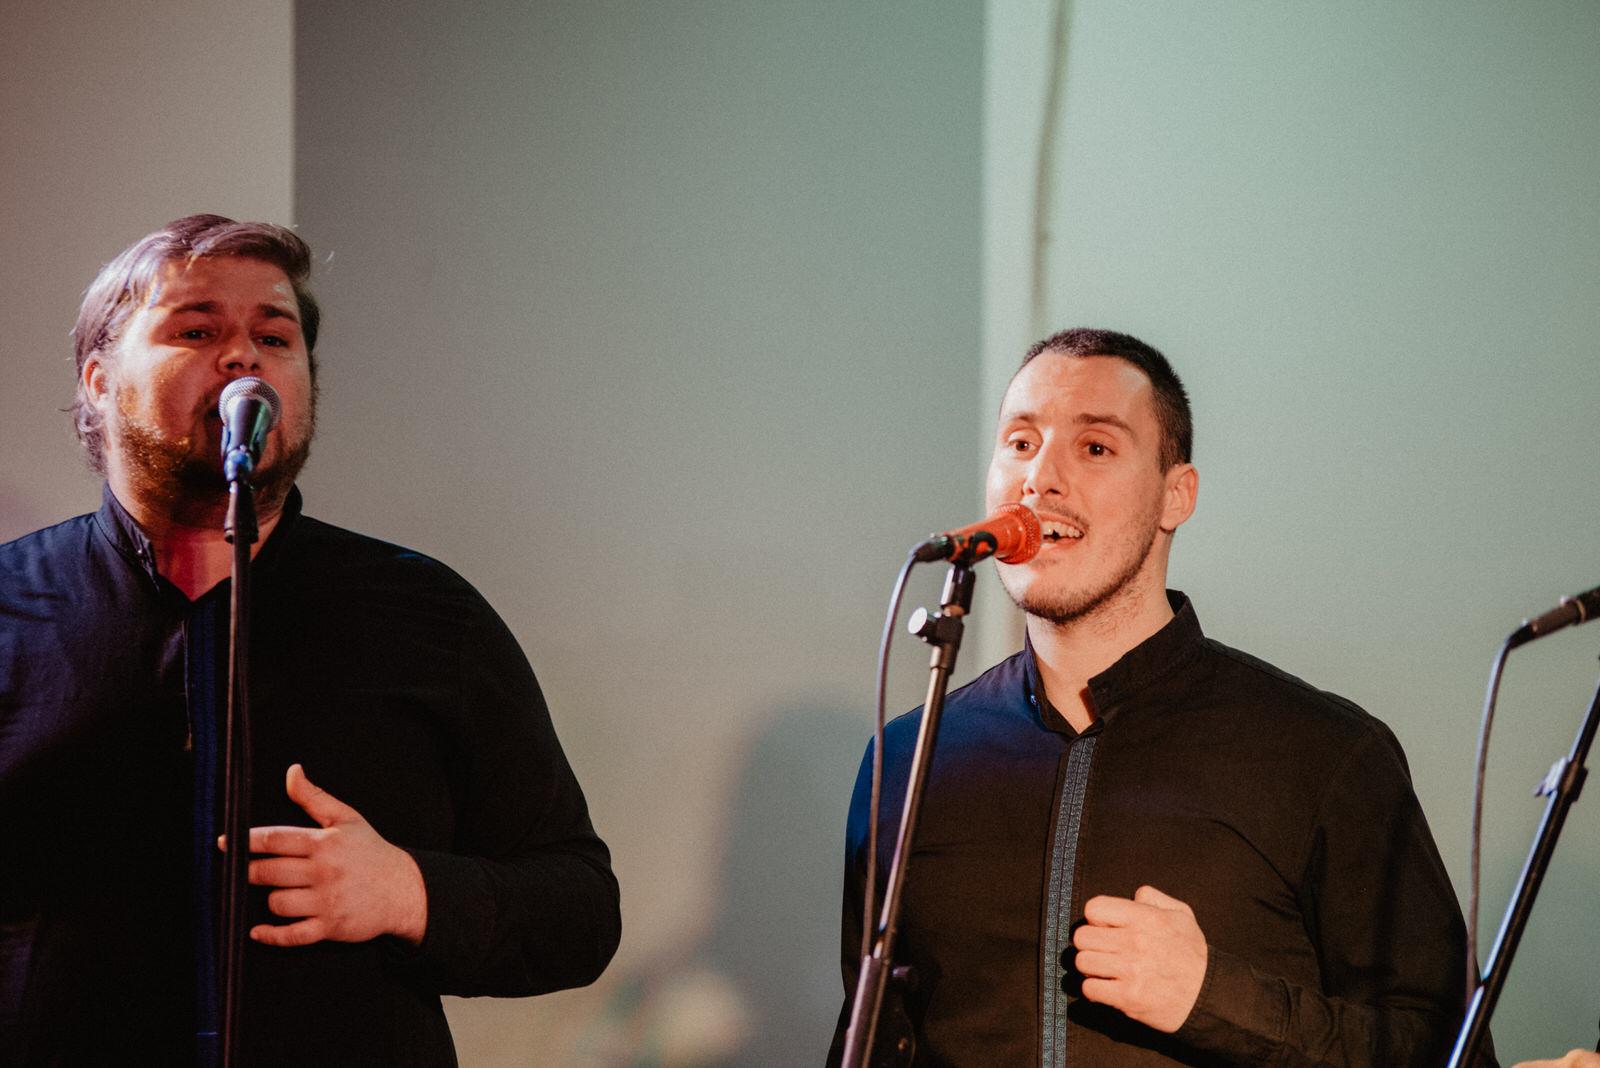 likaclub_koncert-klapa-cambi_kic-gospić_2019-11